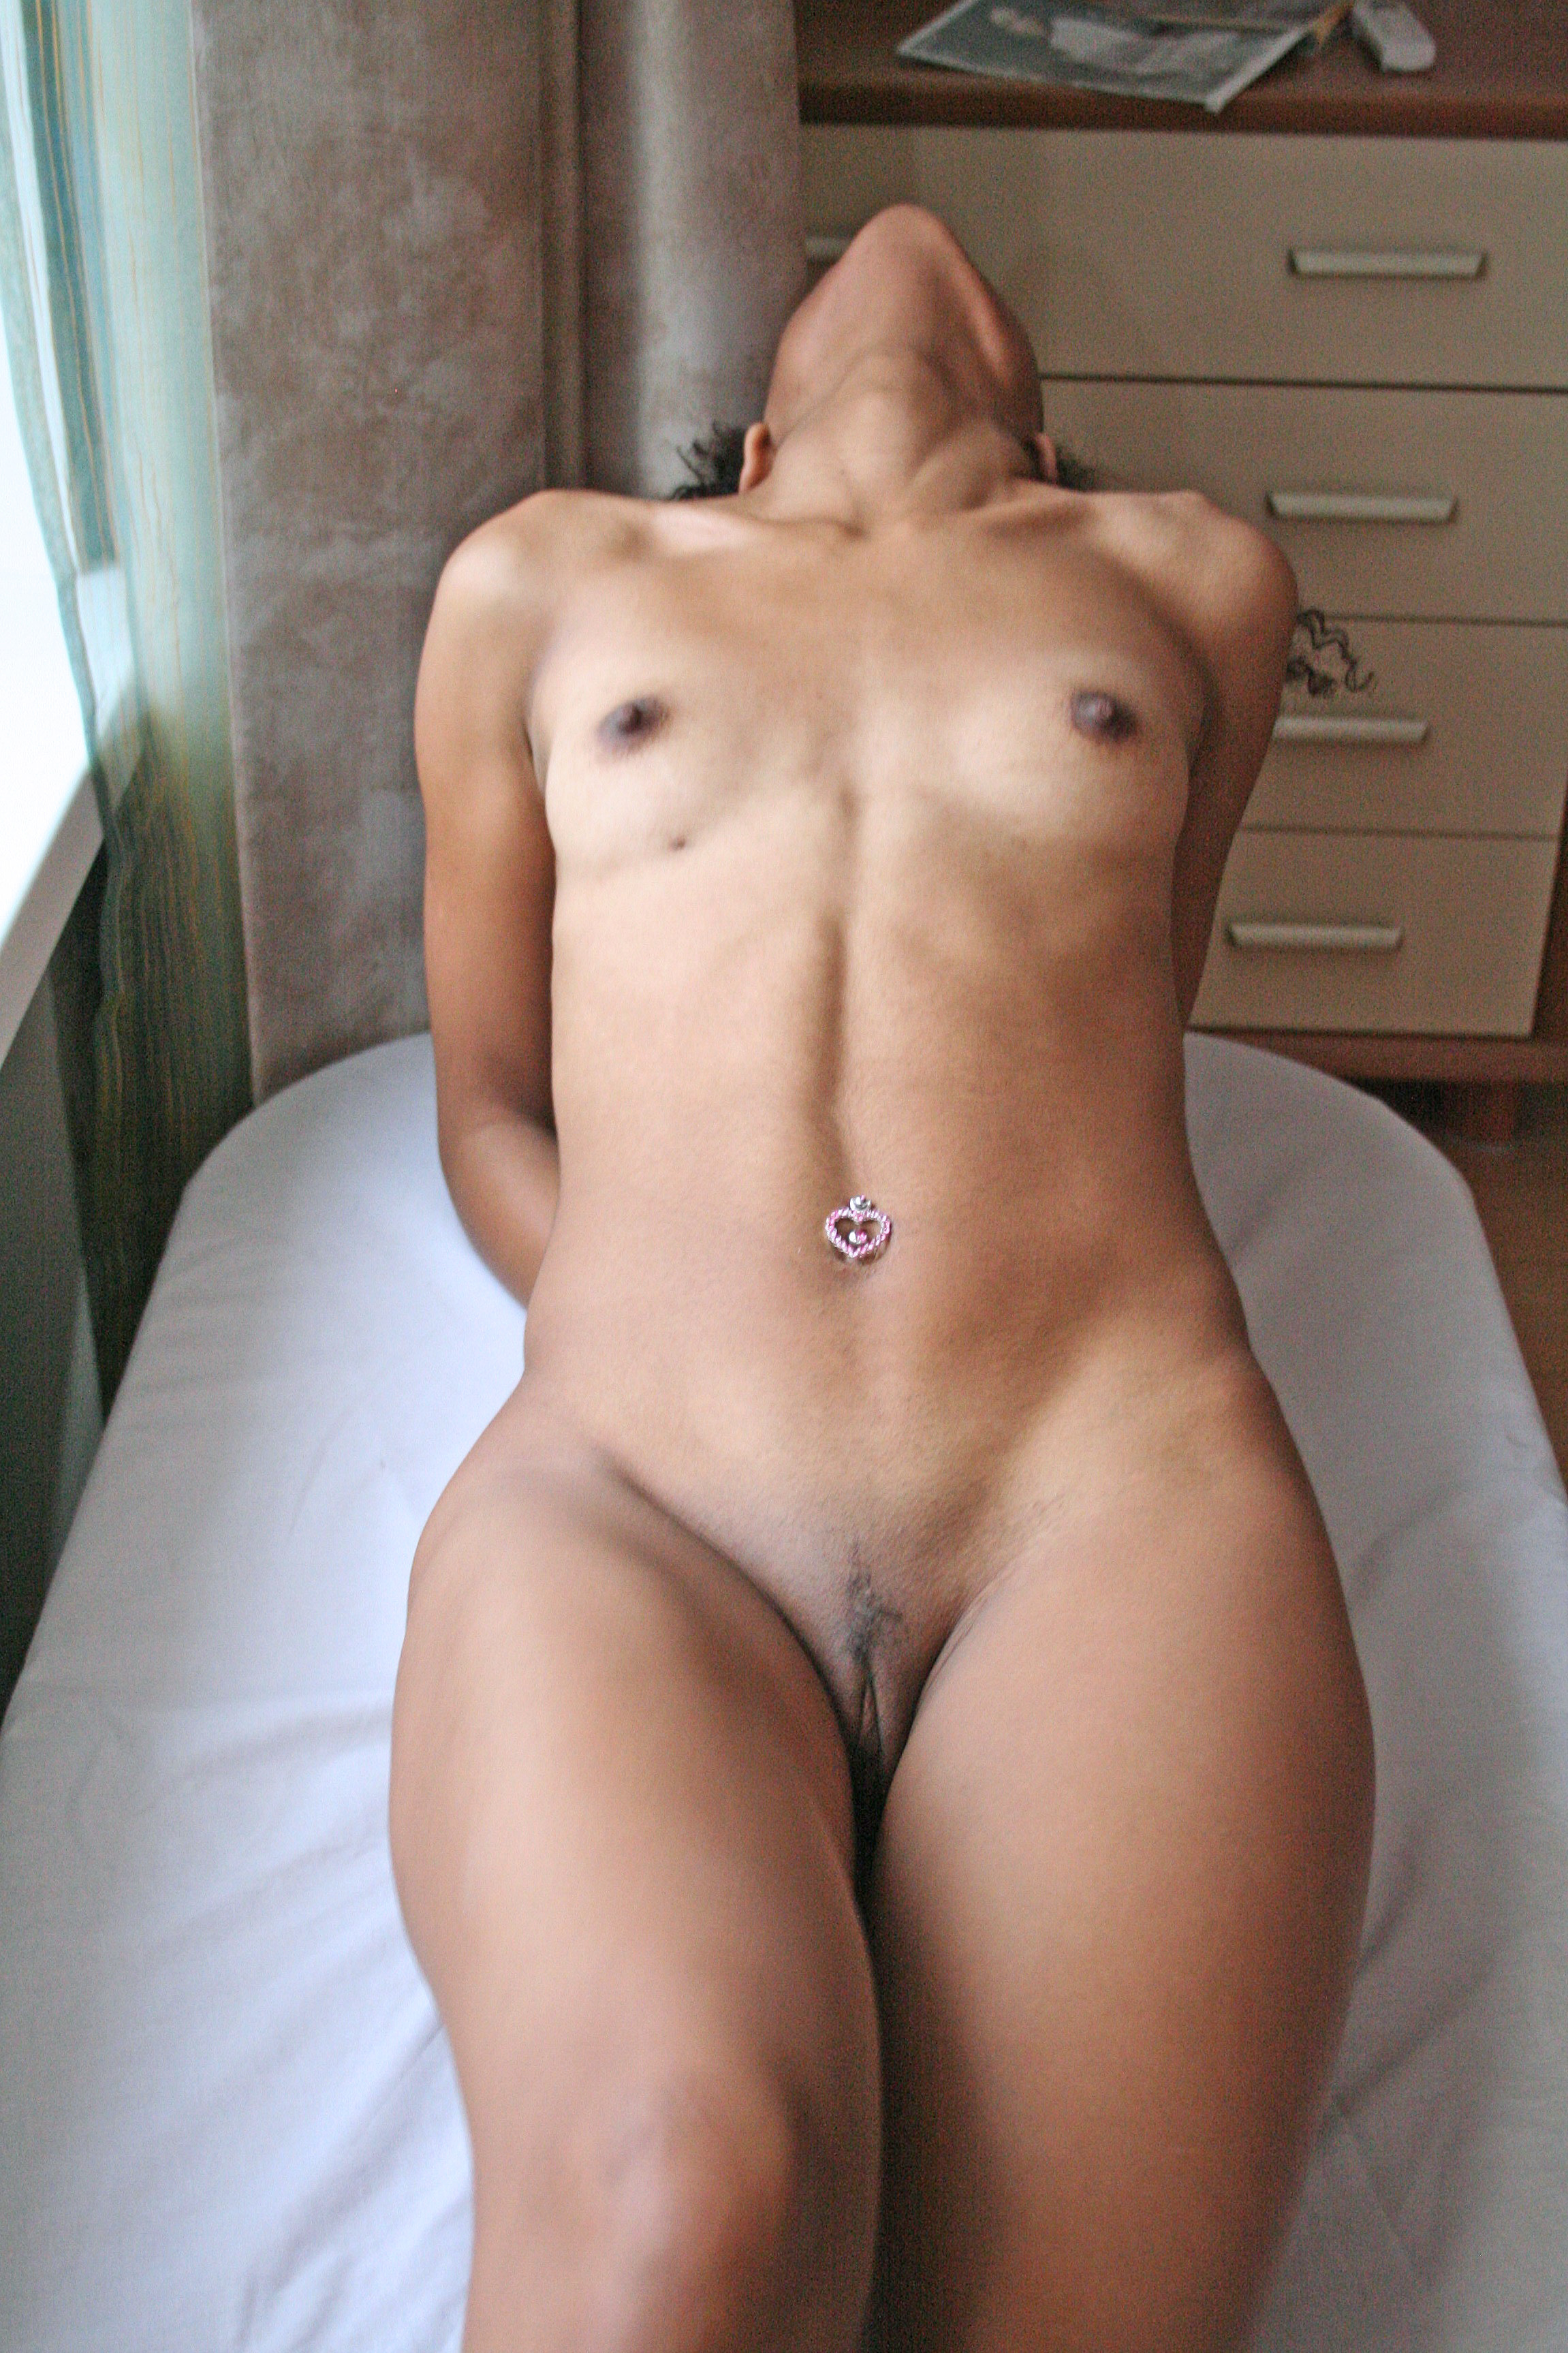 A mature nudist masturbates filmed by a voyeur 1